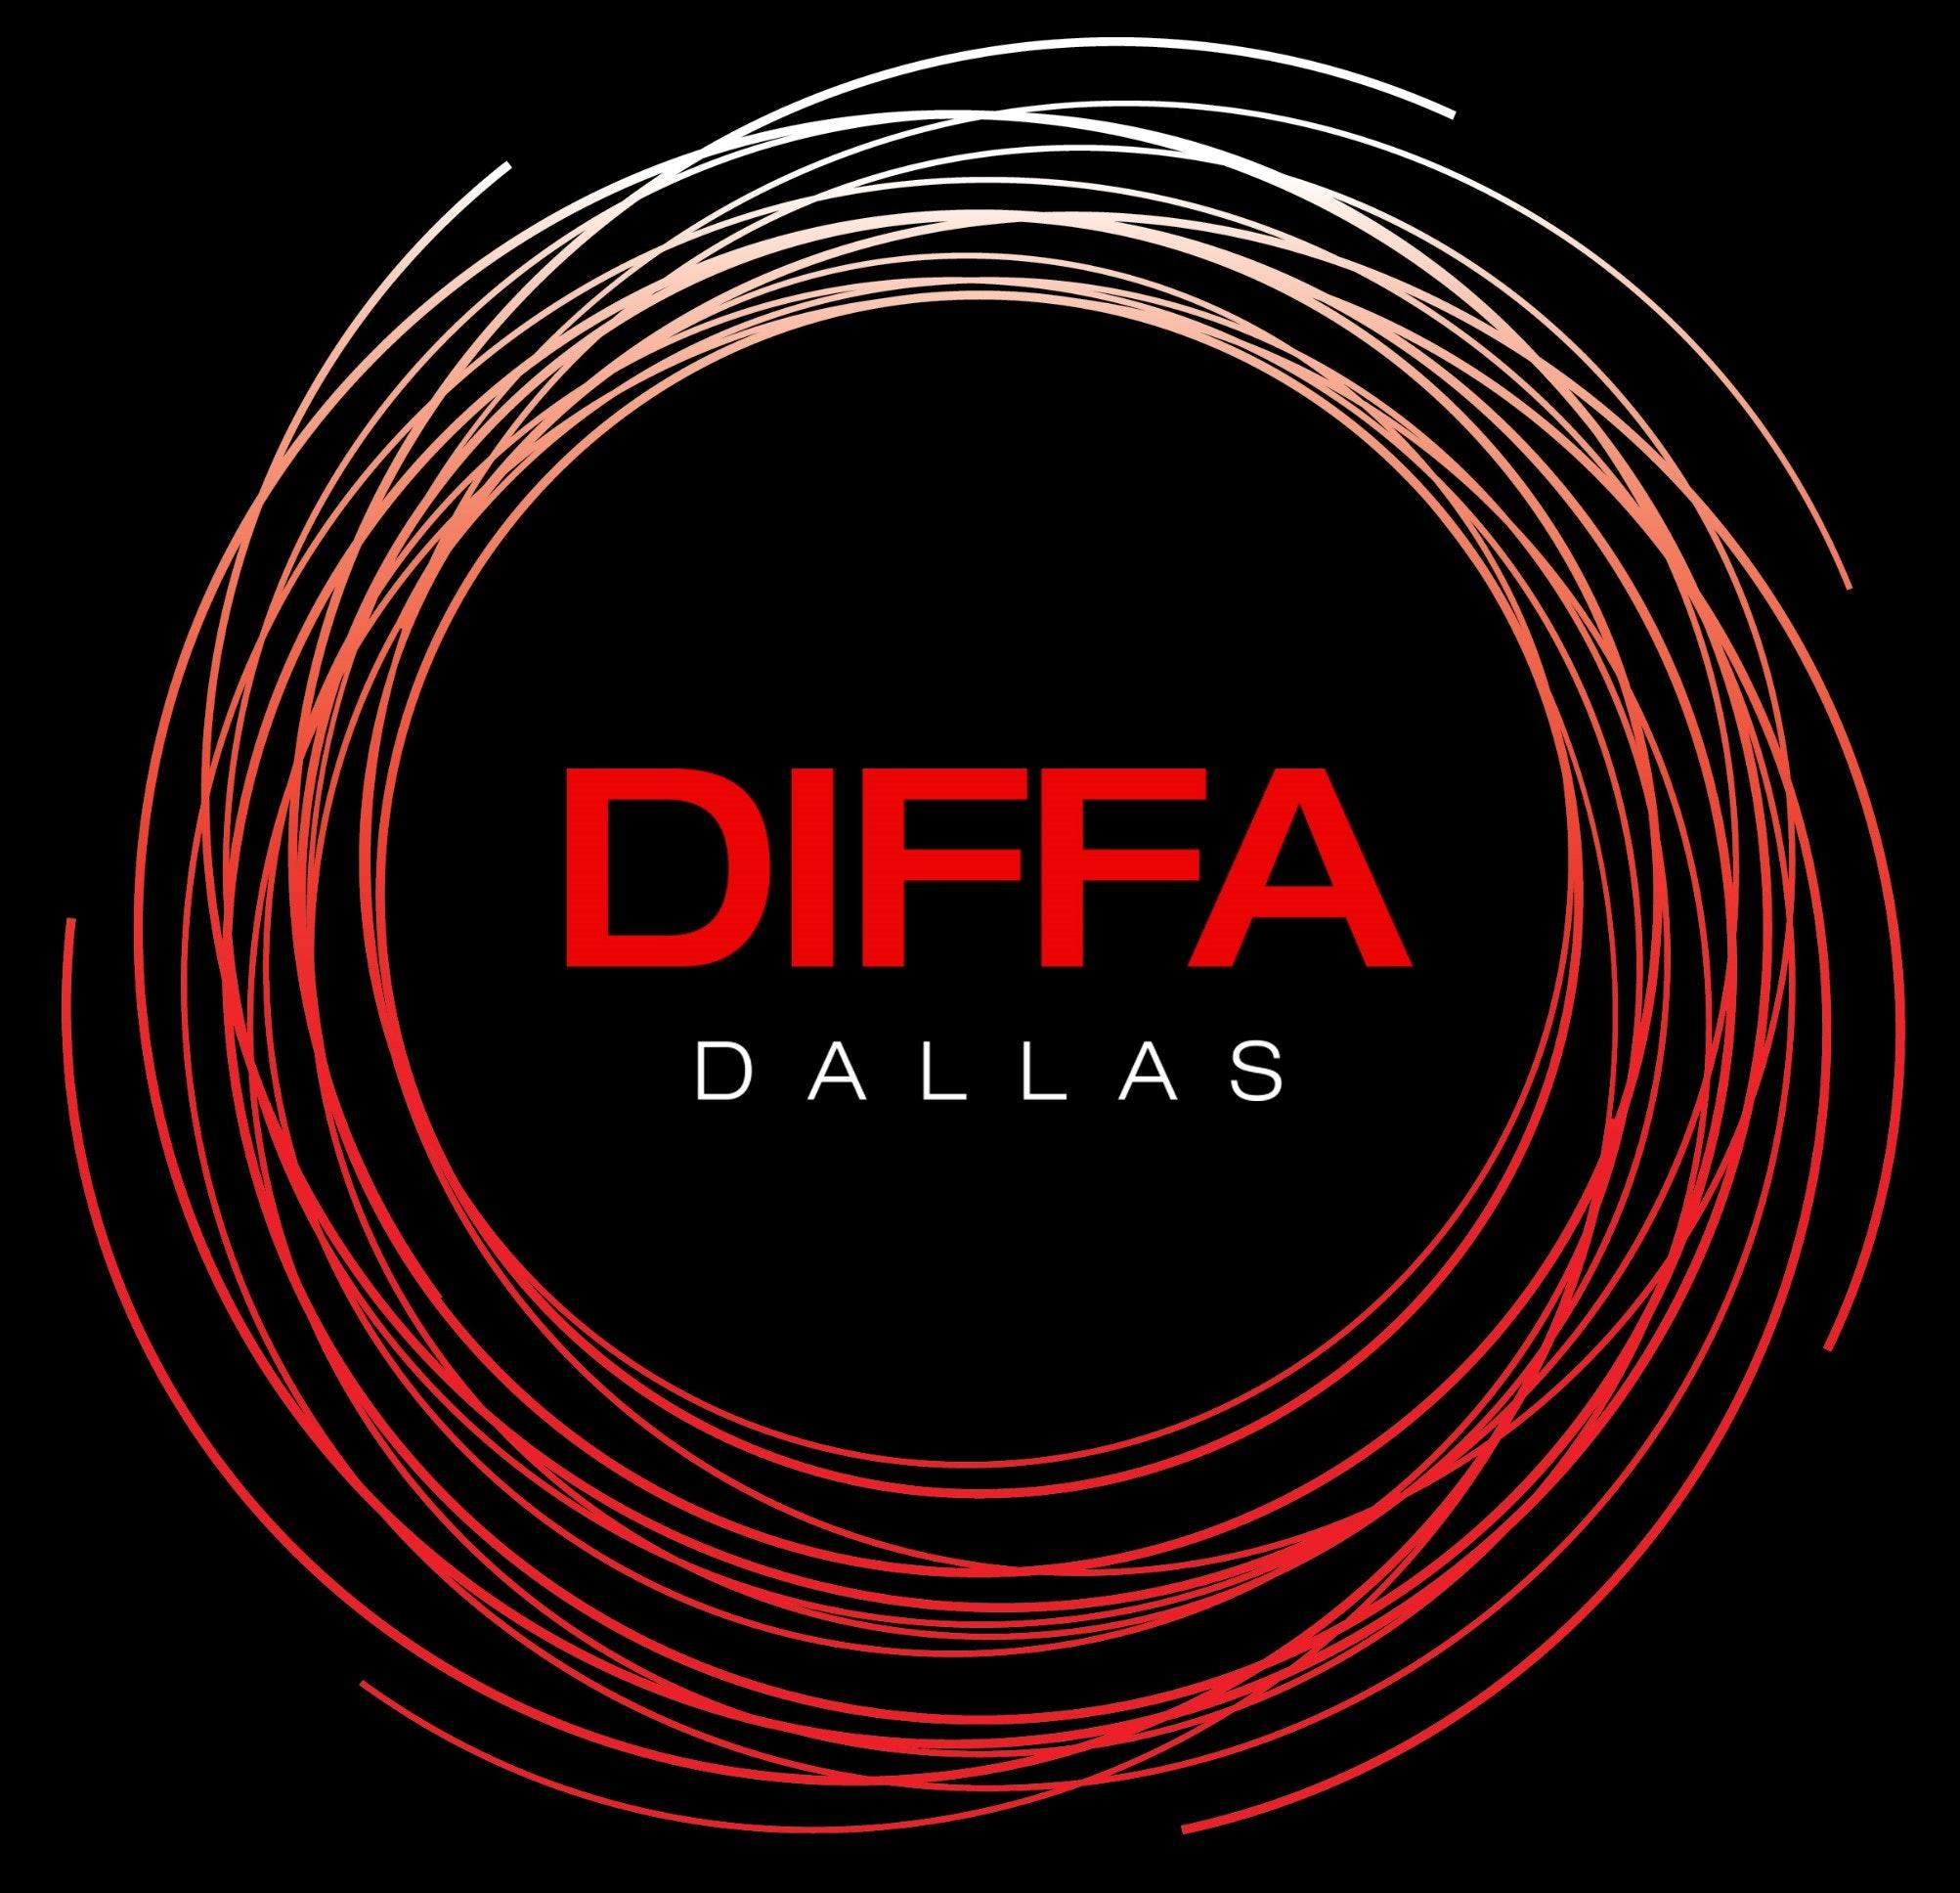 DIFFA/Dallas Holiday Wreath Fundraiser